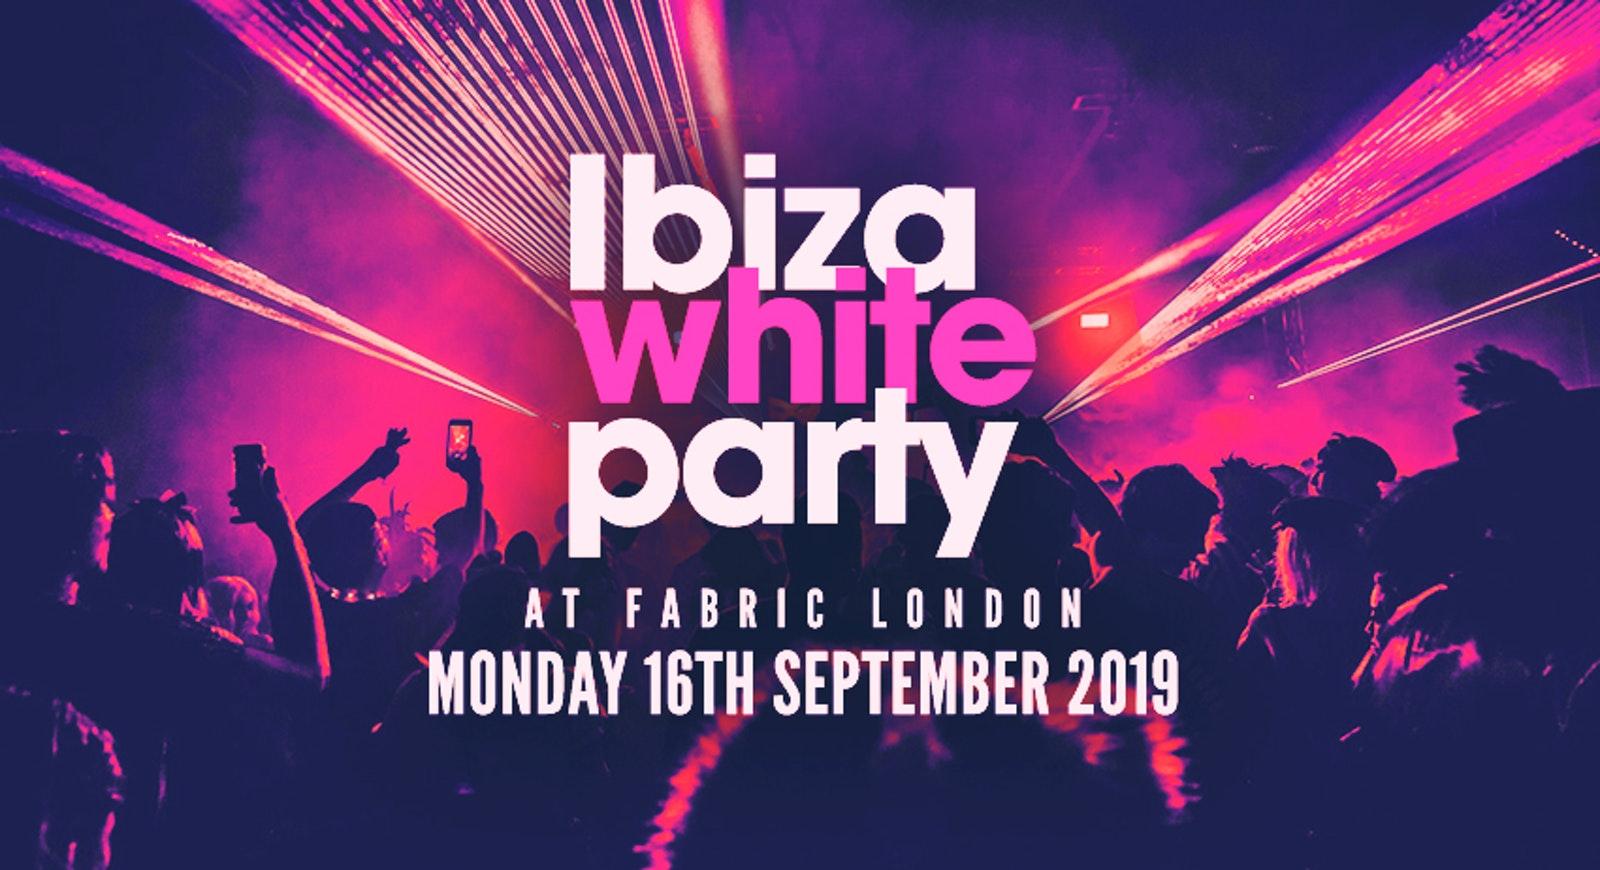 THE 2019 FRESHERS IBIZA WHITE PARTY // FABRIC LONDON